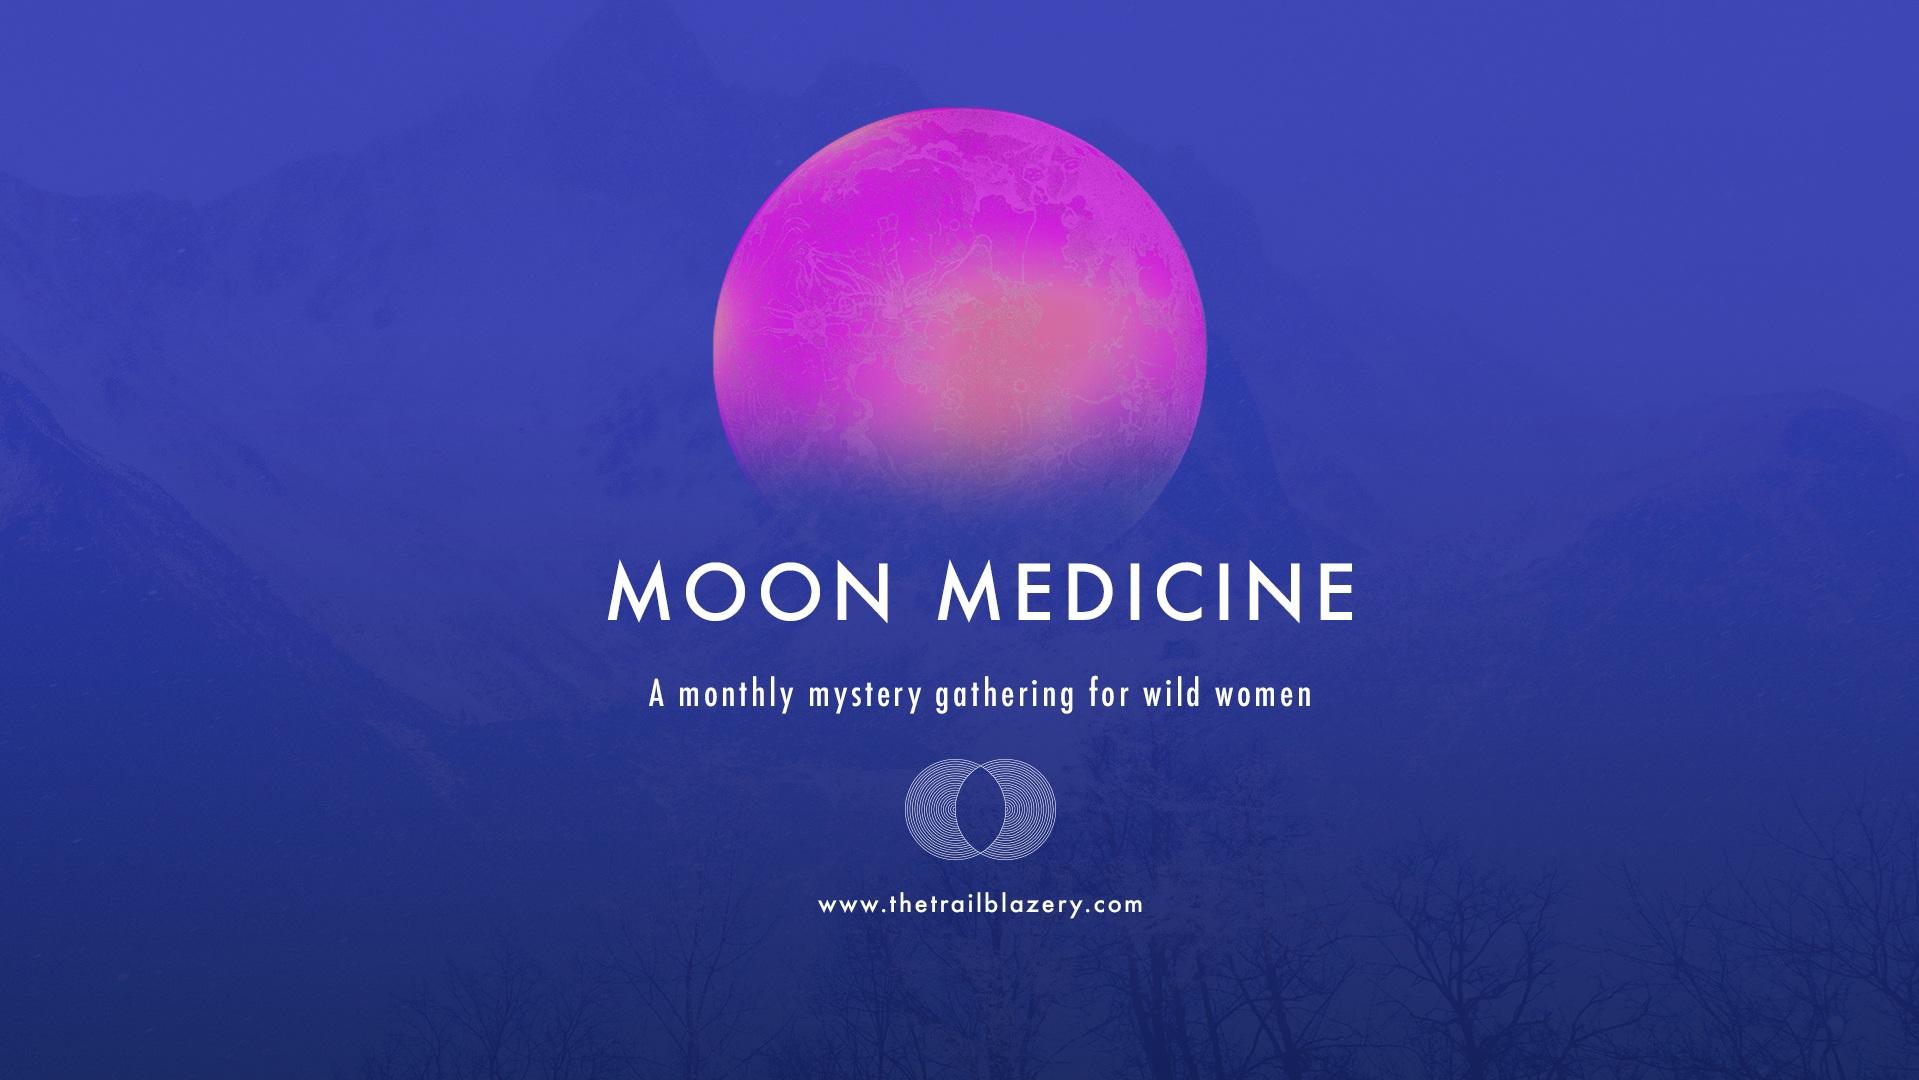 Moon Medicine — The Trailblazery